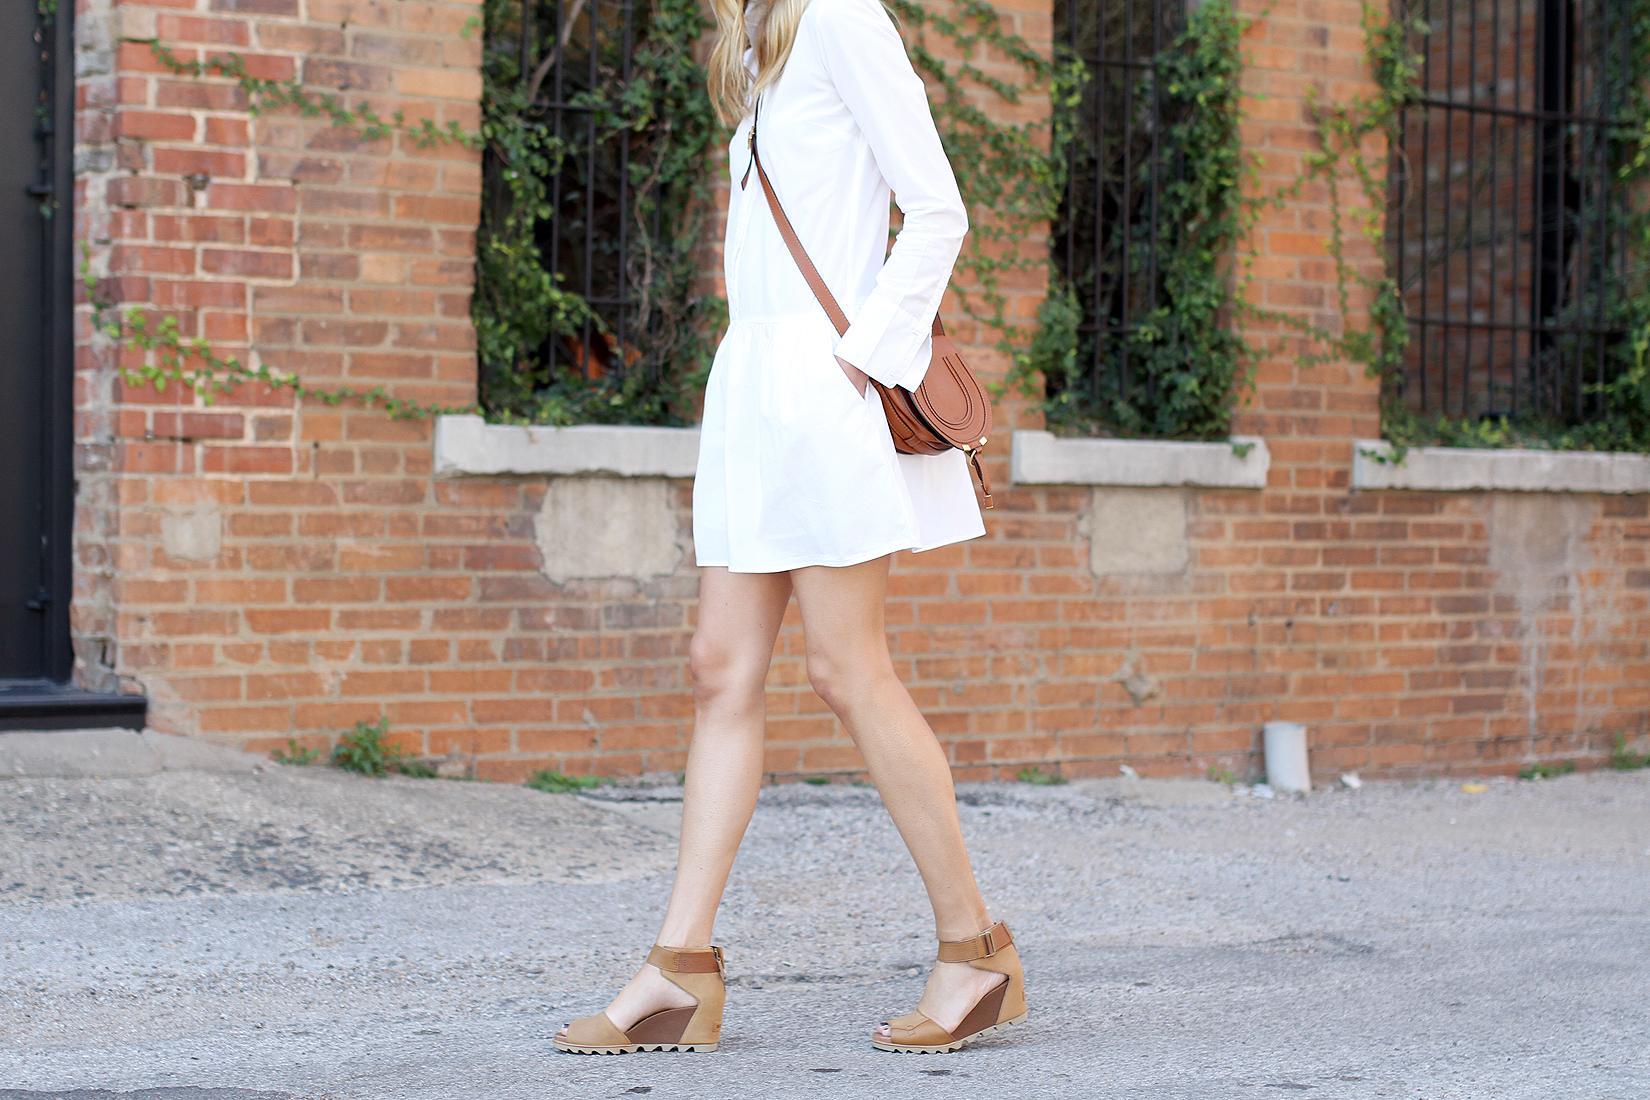 fashion-jackson-sorel-joanine-sandals-chloe-marcie-tan-crossbody-splendid-damsel-white-shirtdress